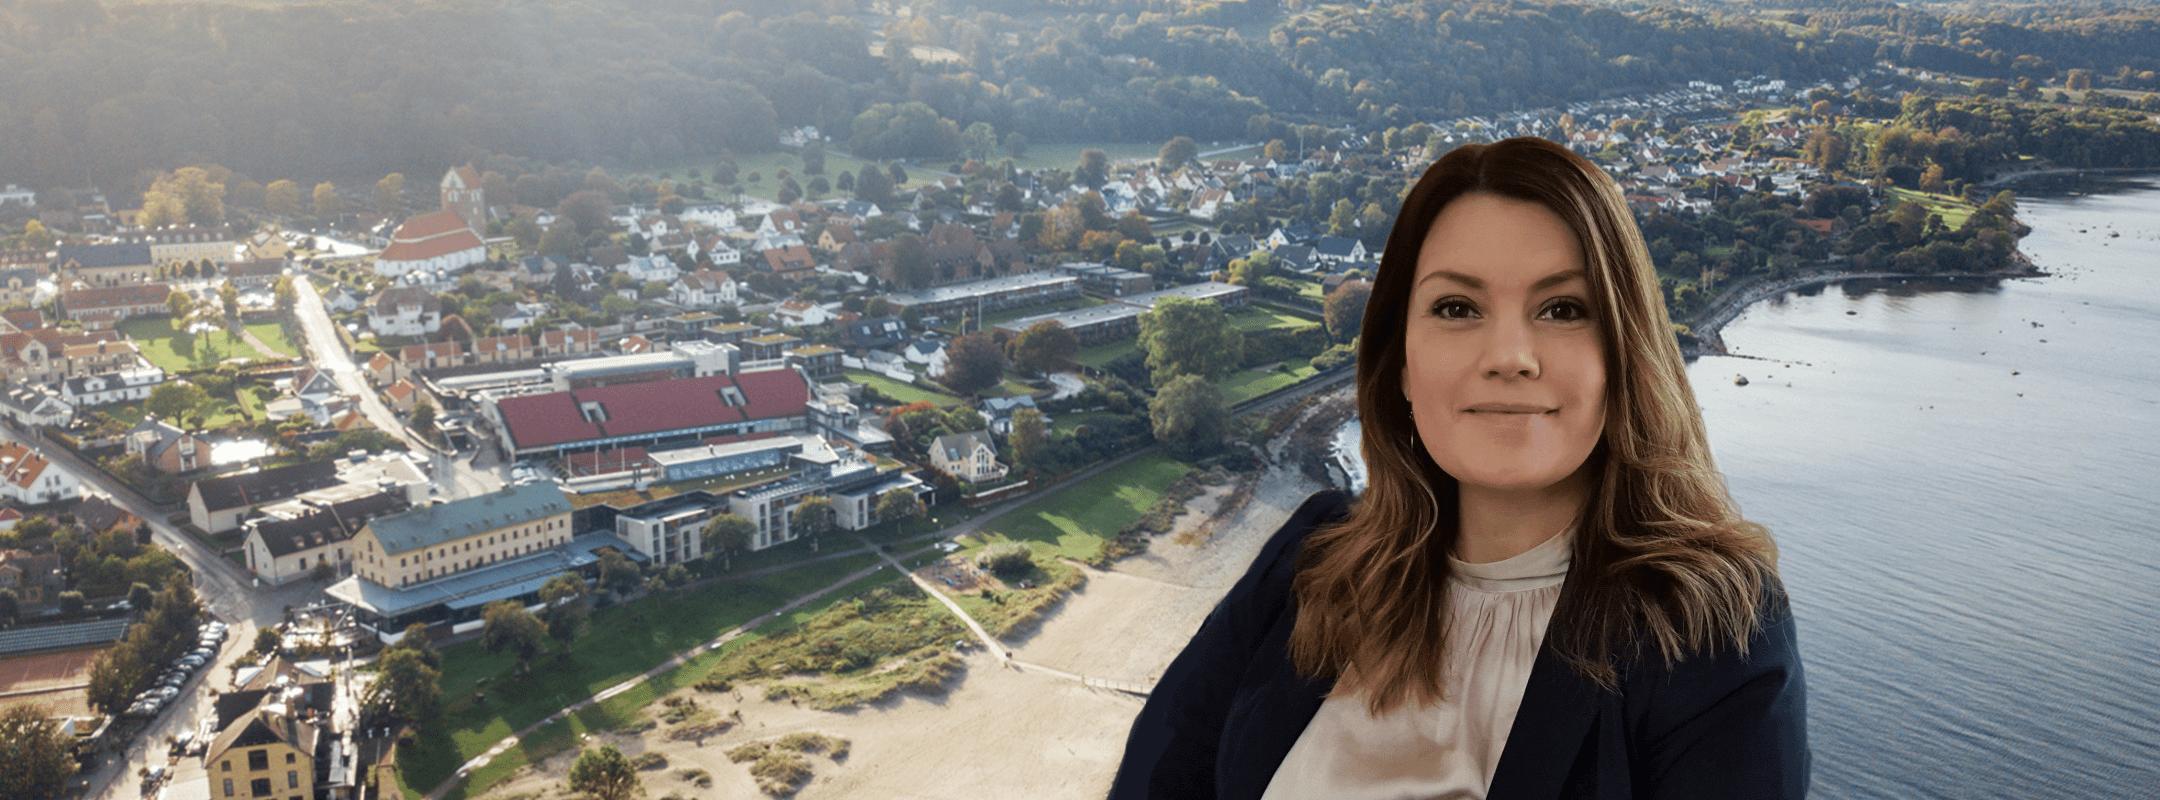 Патрисия Ханссон Бизнес-разработчик Båstad Turism & Näringsliv